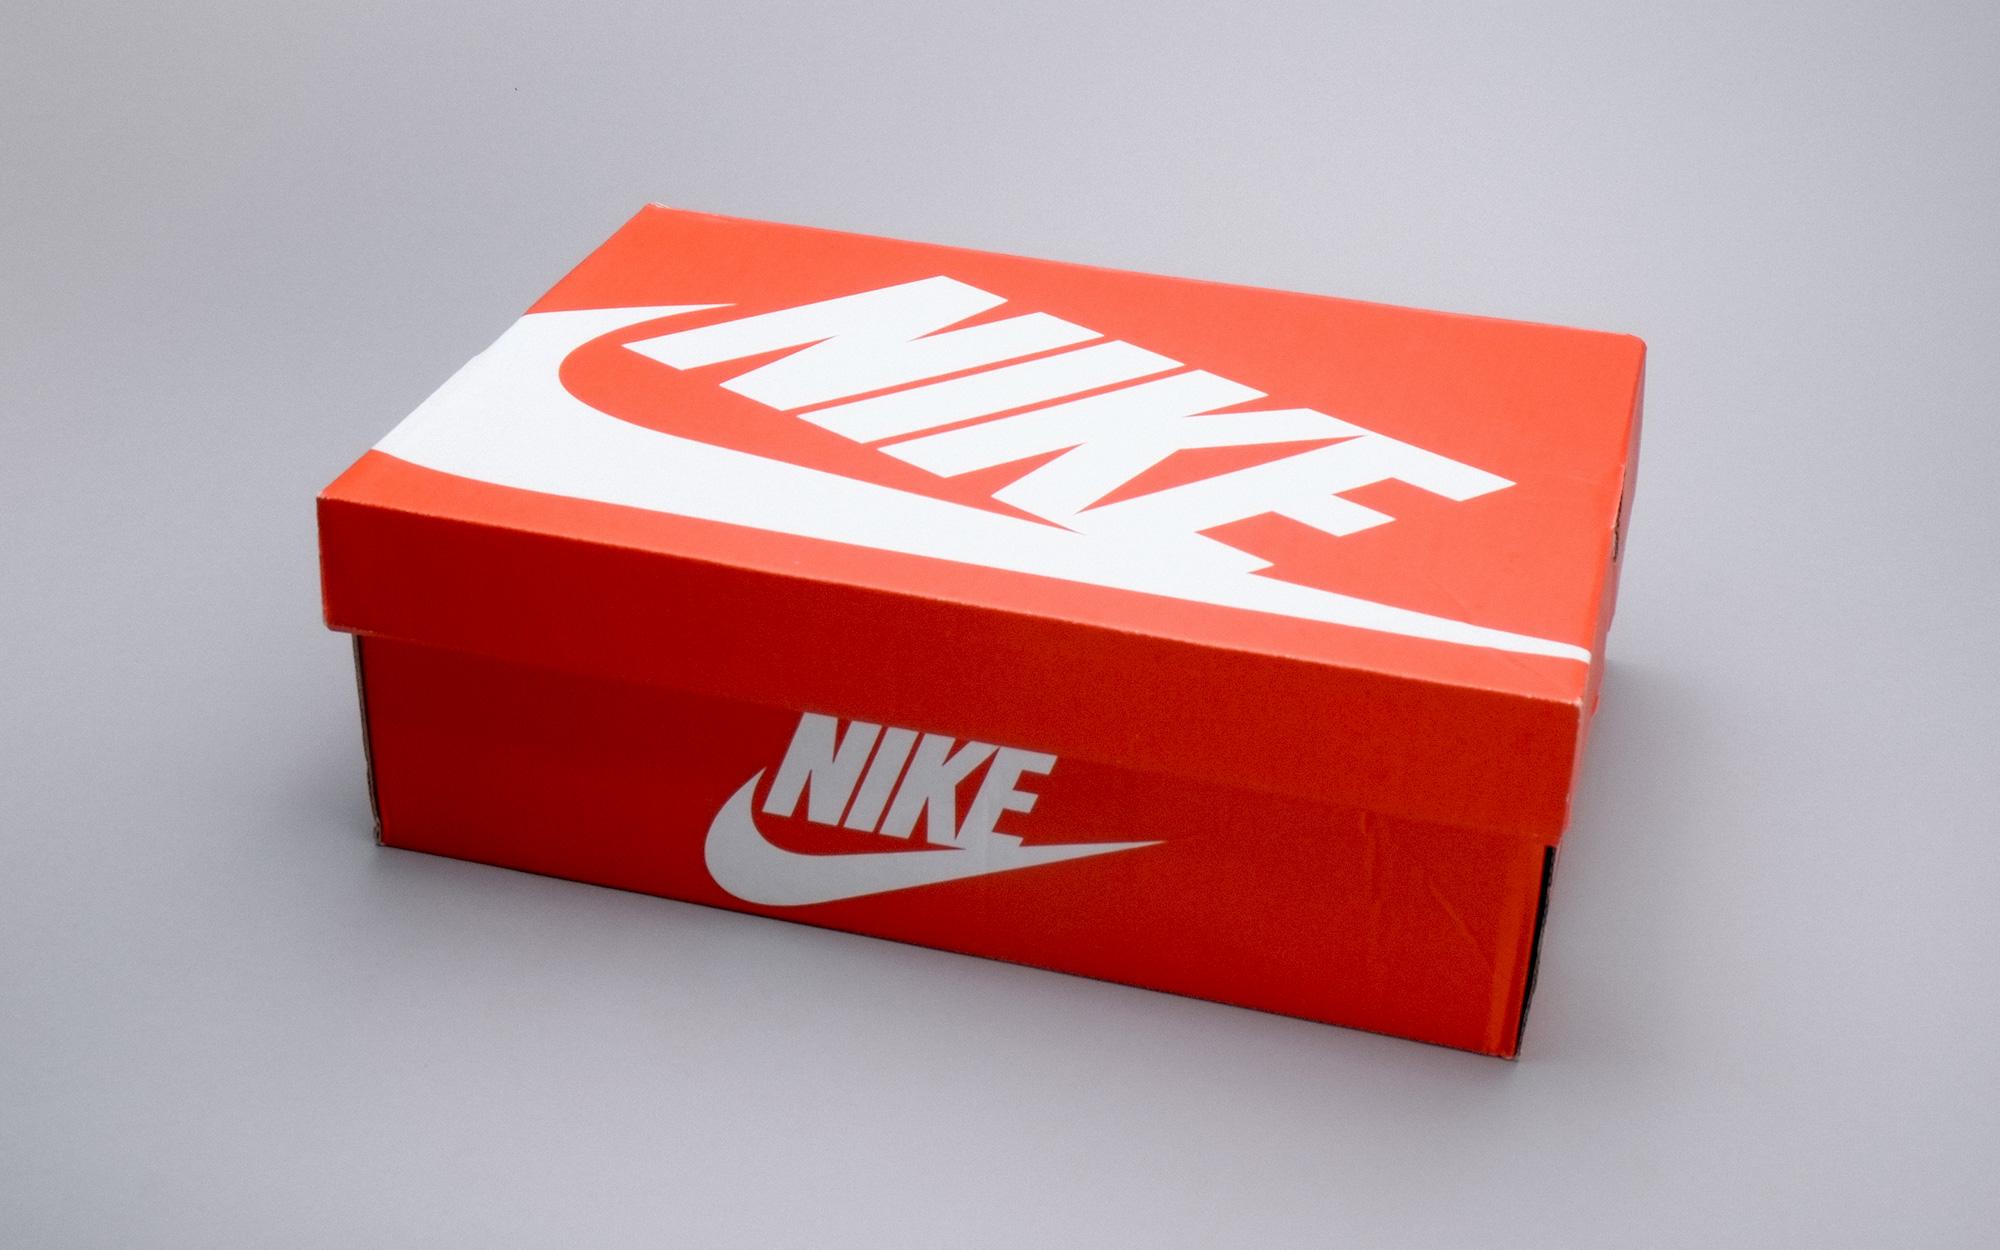 2000x1250 Nike Shoebox Brainrental Lab